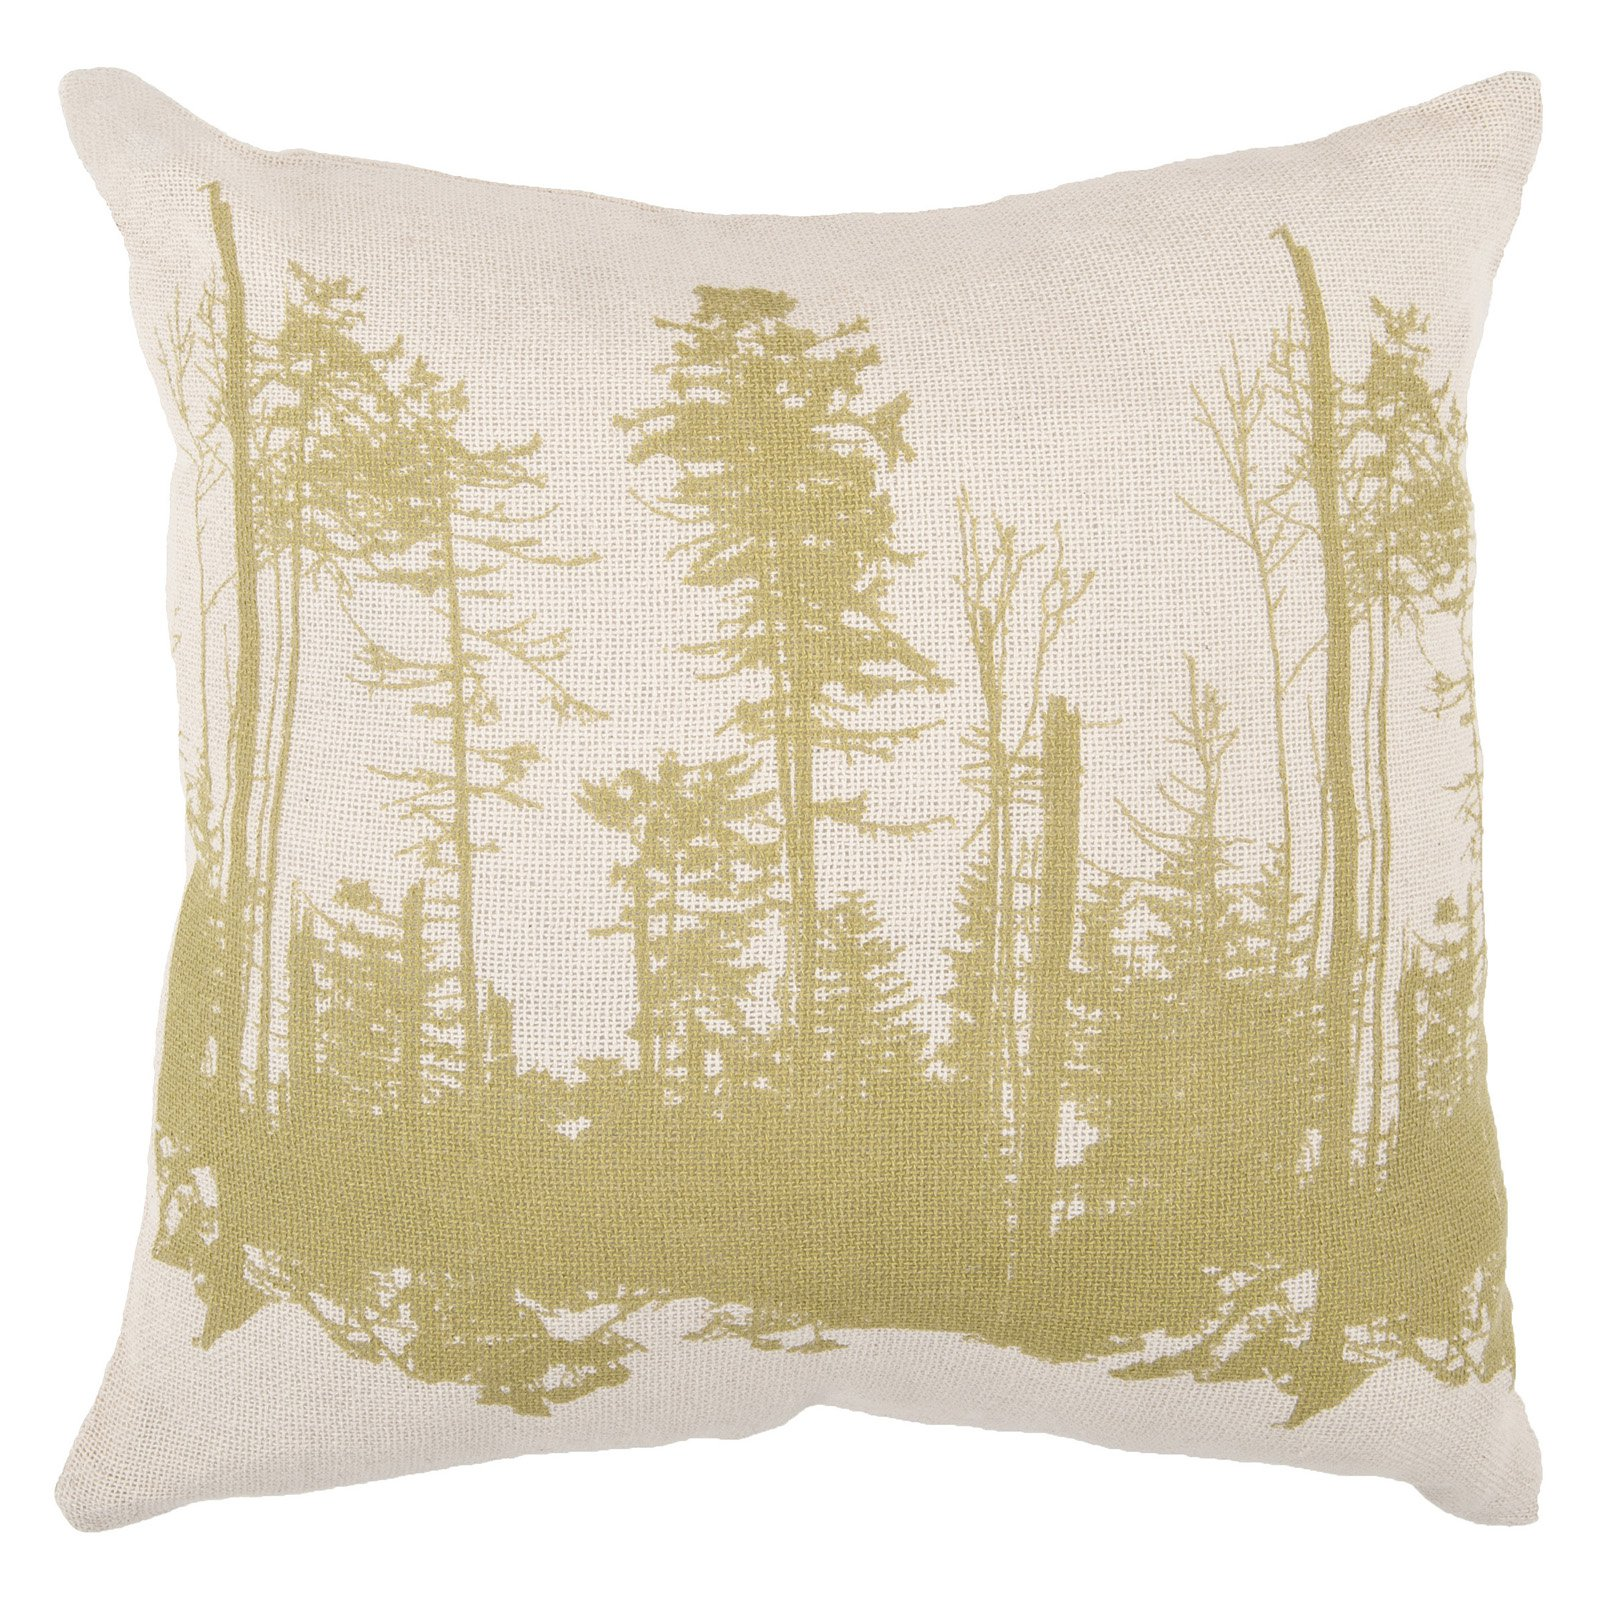 Surya Amazon Decorative Pillow - Tan